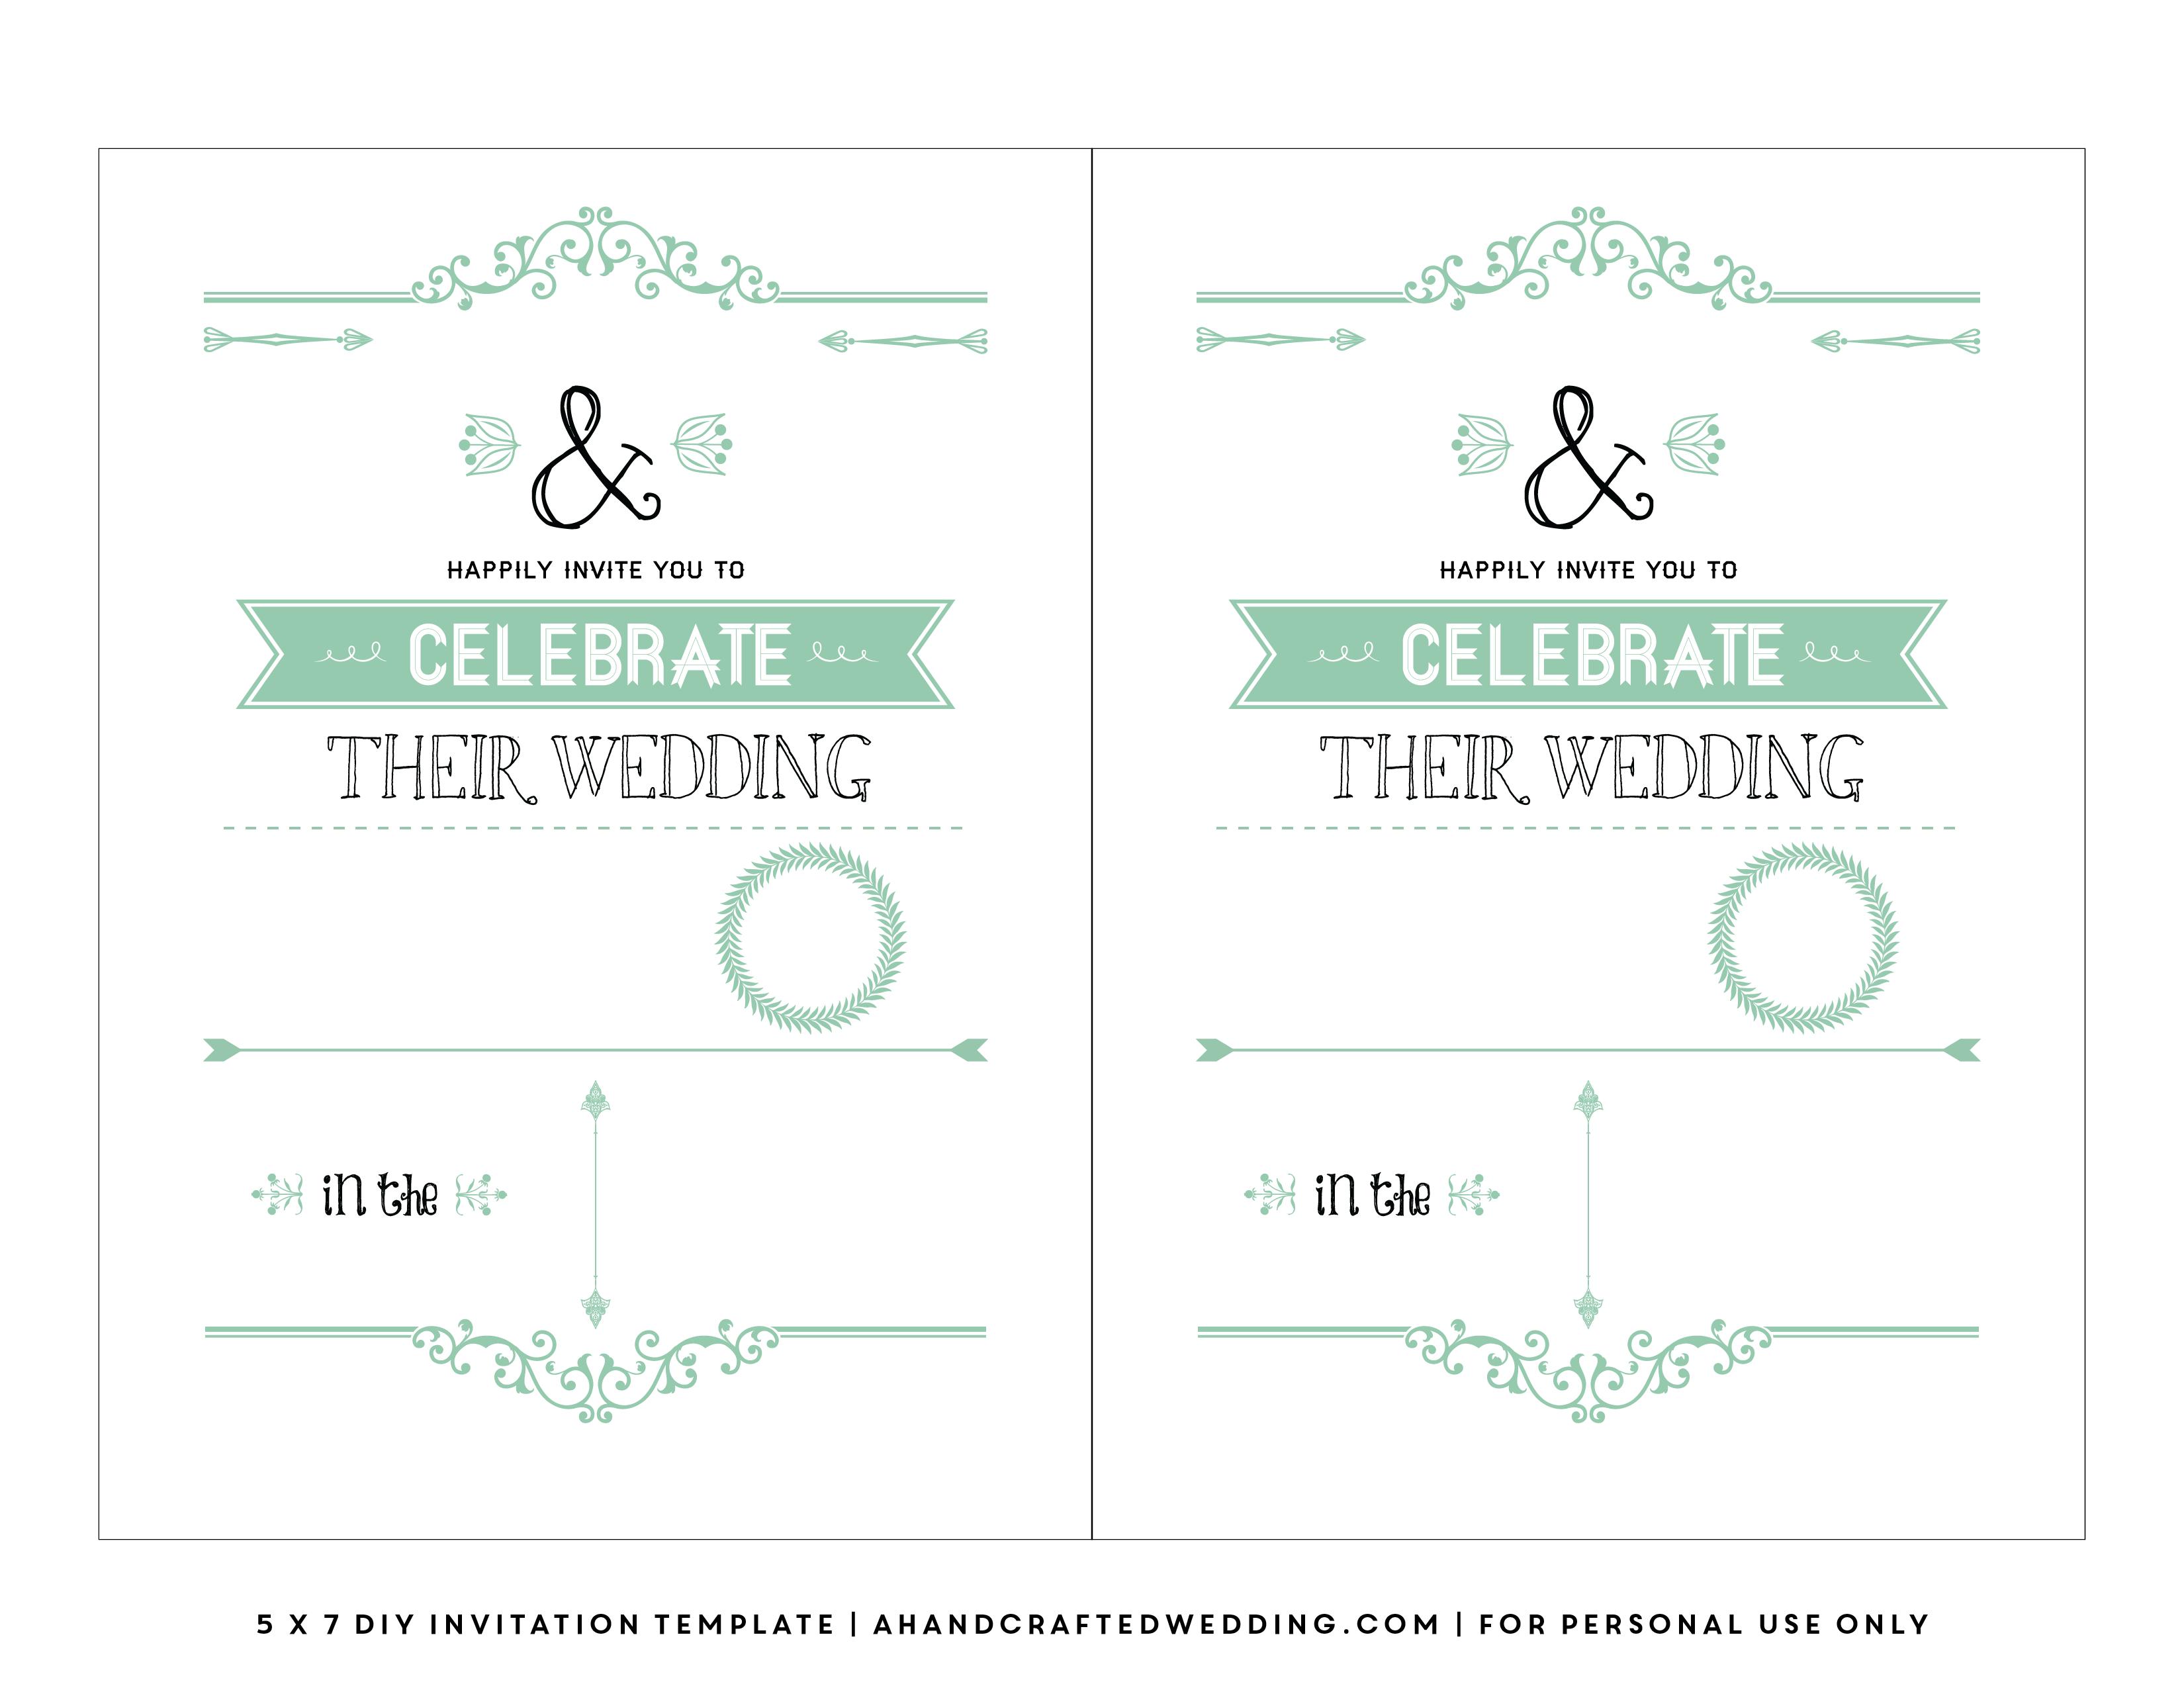 FREE Rustic Wedding Invitation Template Ahandcraftedwedding.com For